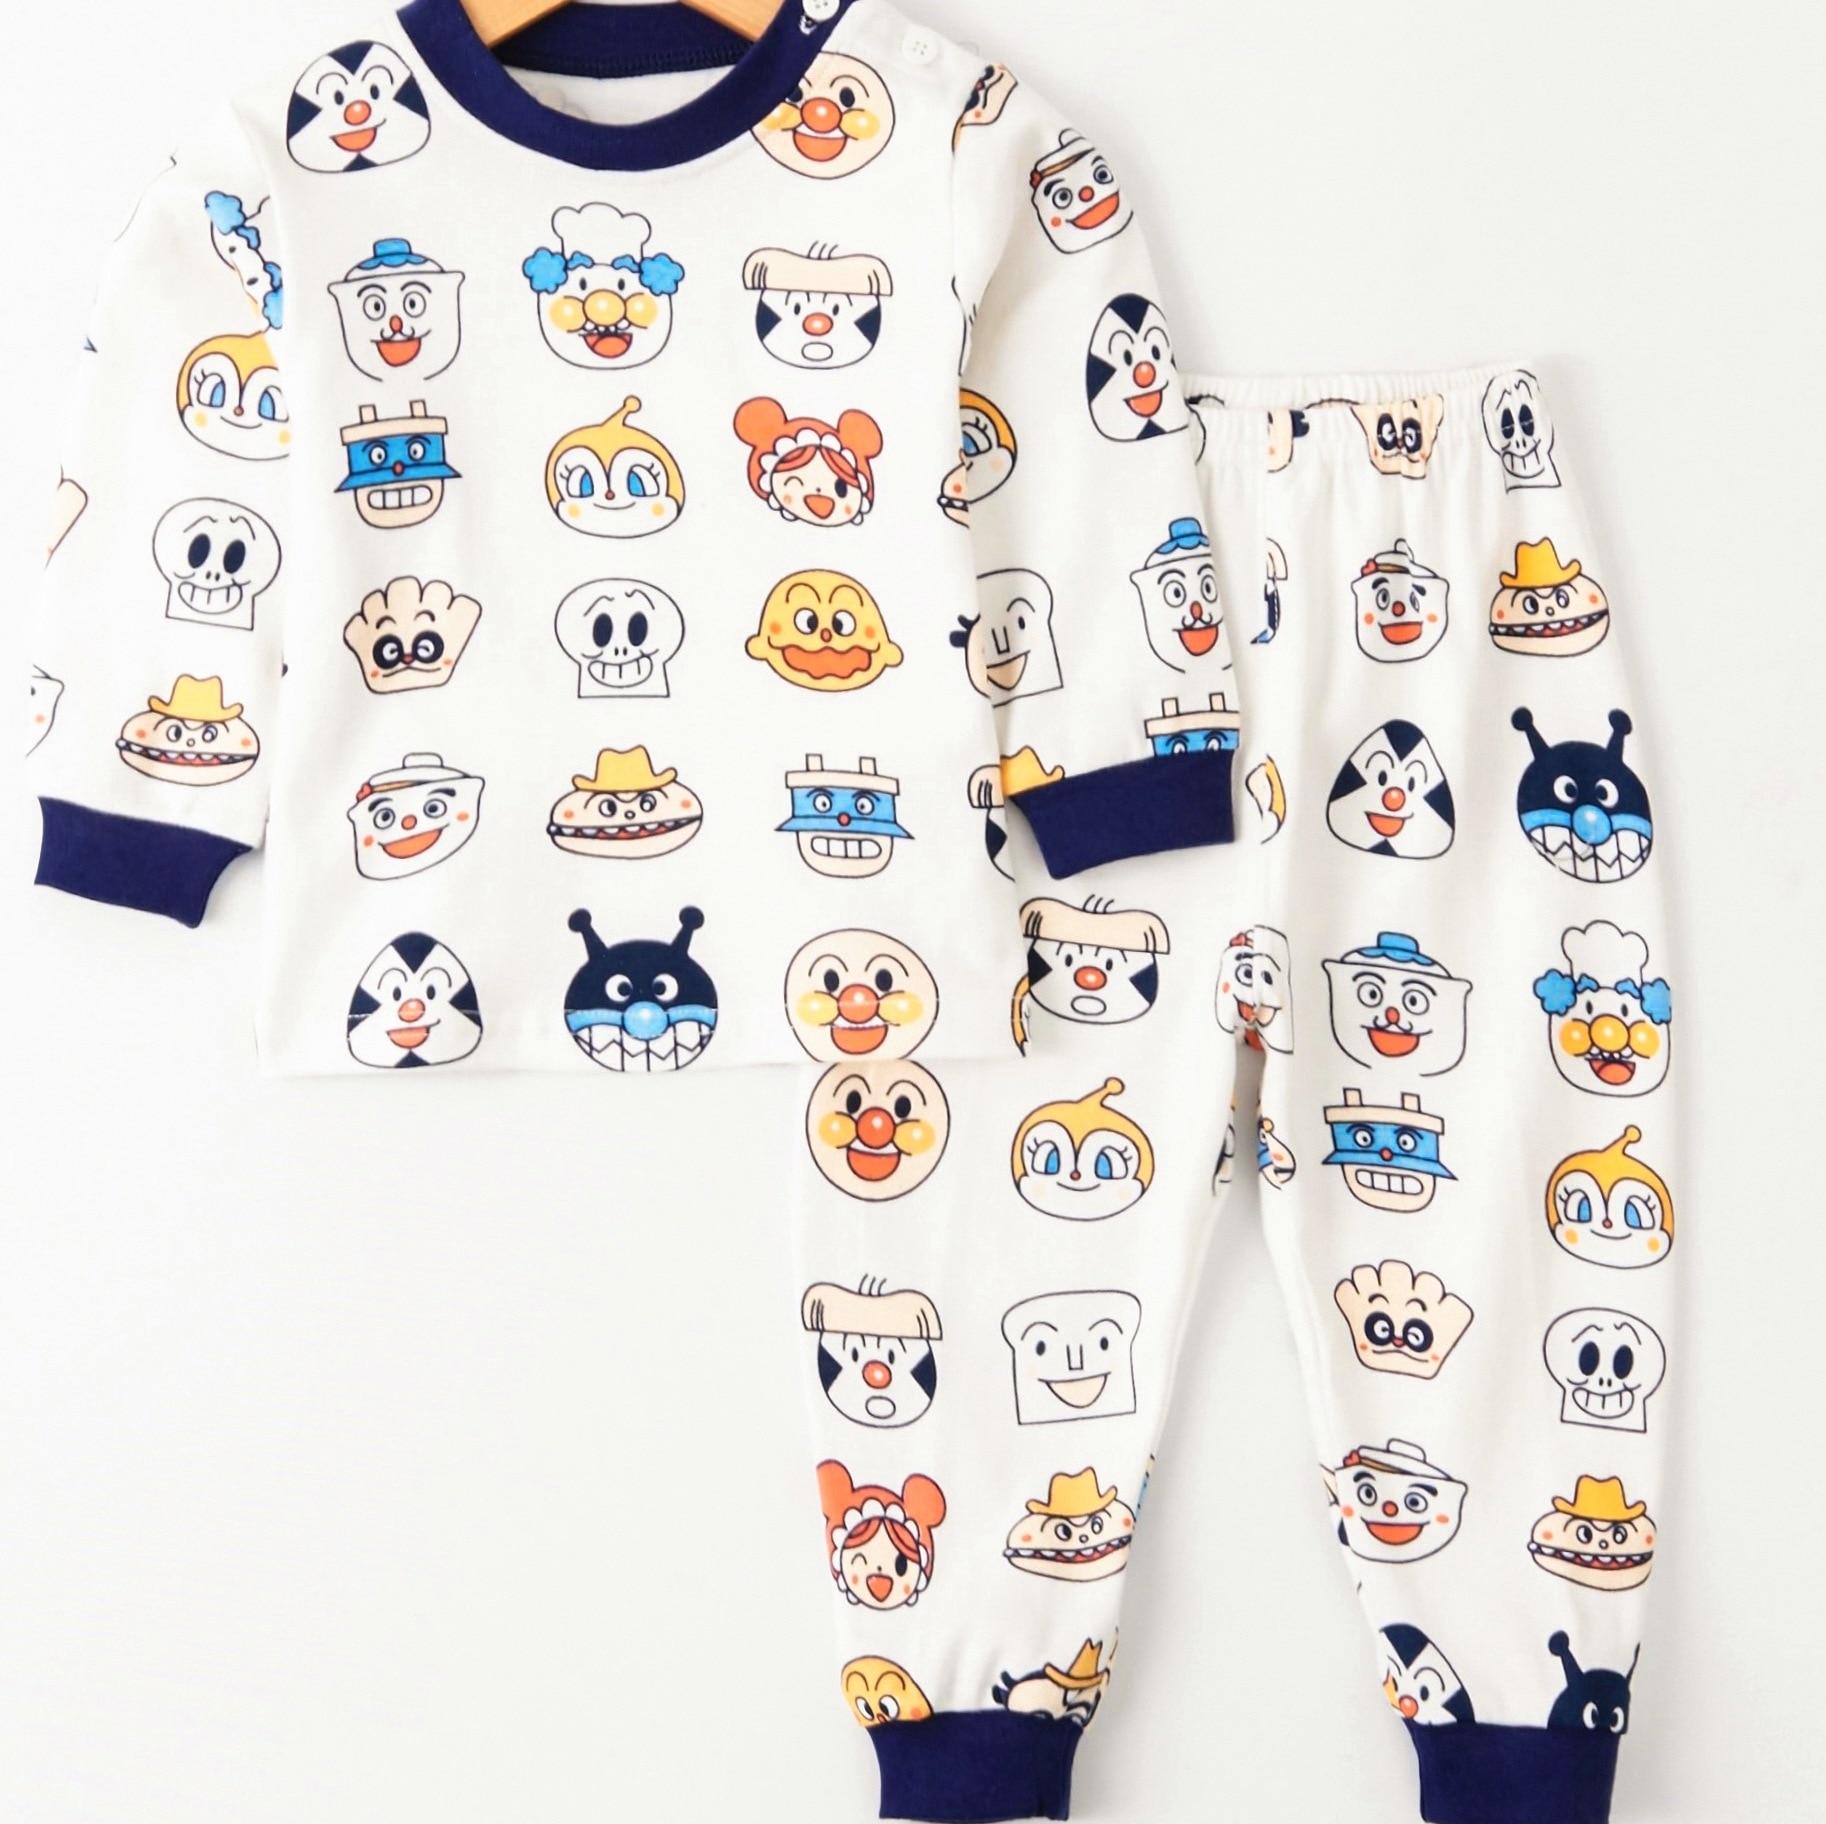 CHILDREN'S Underwear Pure Cotton Long Underwear Suit Superman Childrenswear Spring And Autumn Pajamas Cartoon Pajamas Baby Base